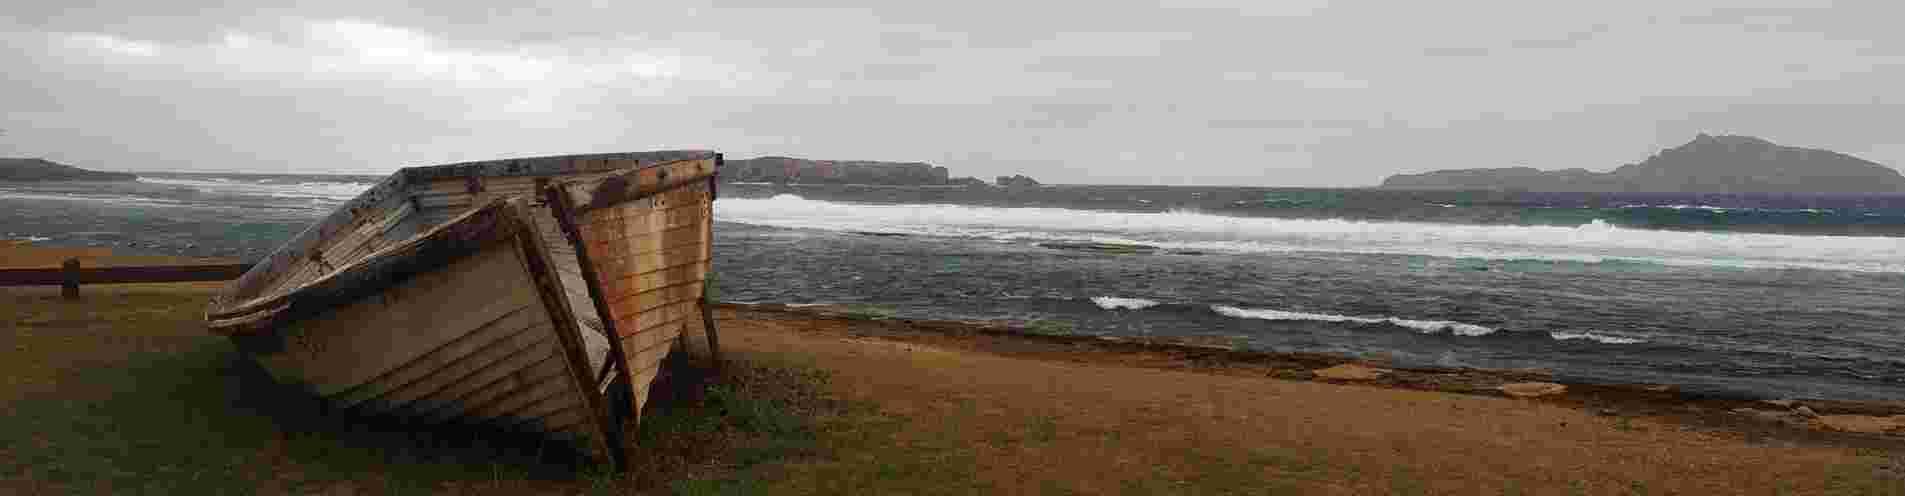 Norfolk by nature header image